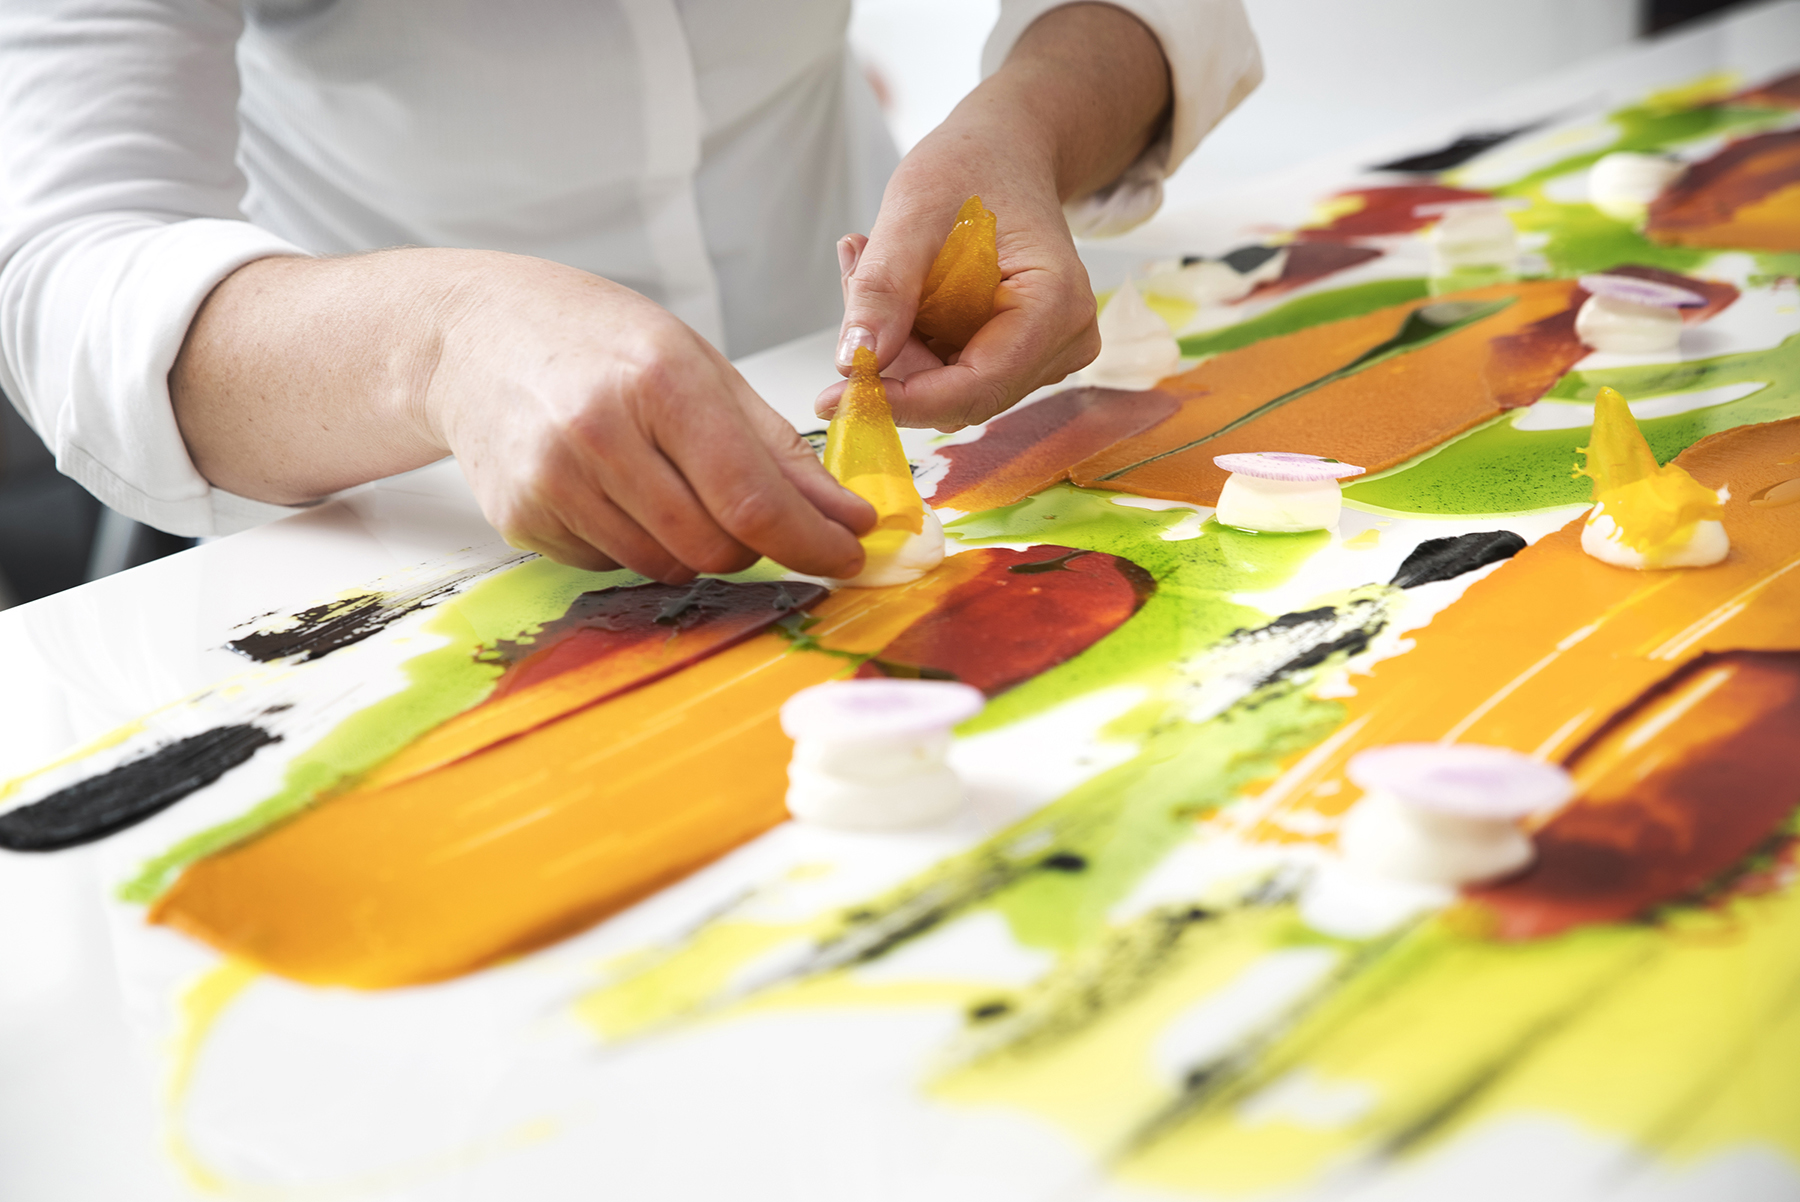 2018-EETSCHILDERIJ-Flavour painting_FHV8554.jpg